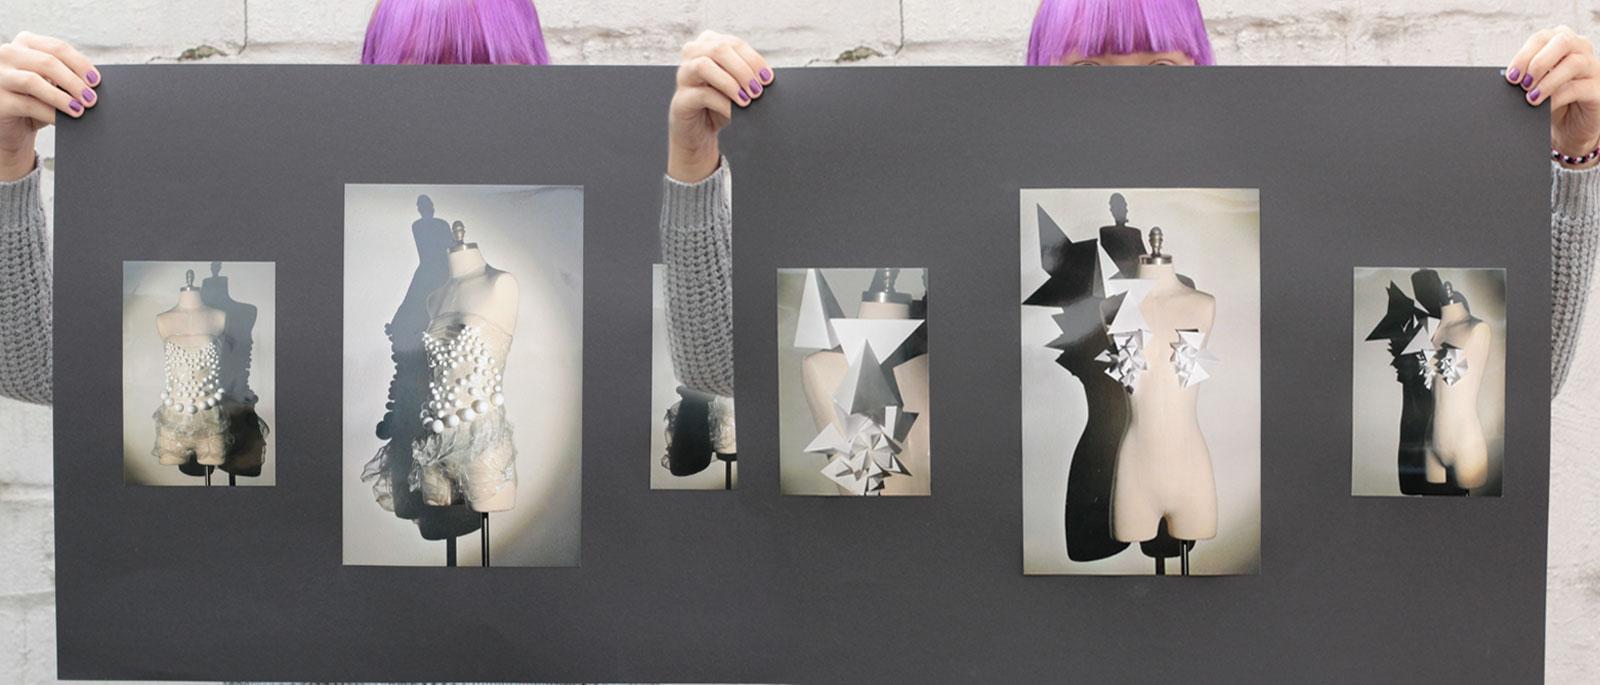 Modedesign_Mappenkurs_talentstudio_stuttgart